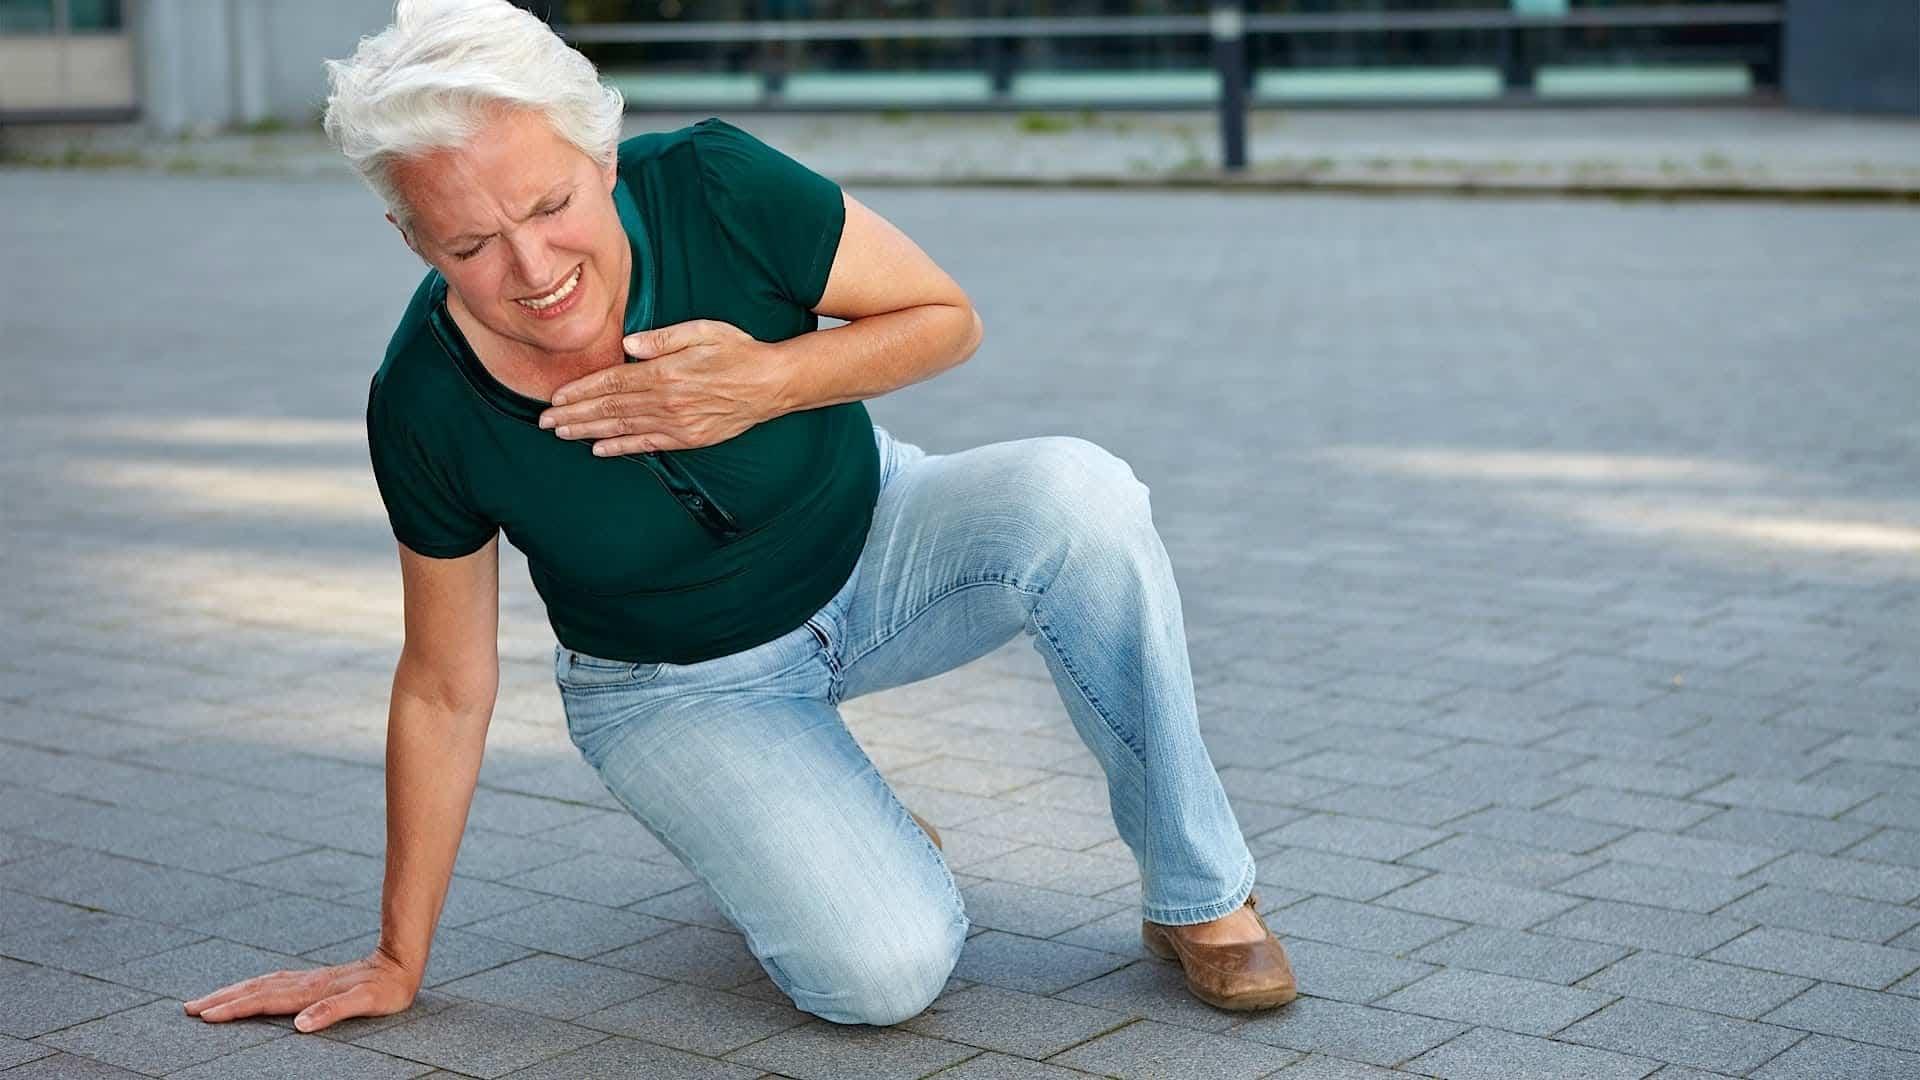 Острый инфаркт миокарда передней стенки левого желудочка